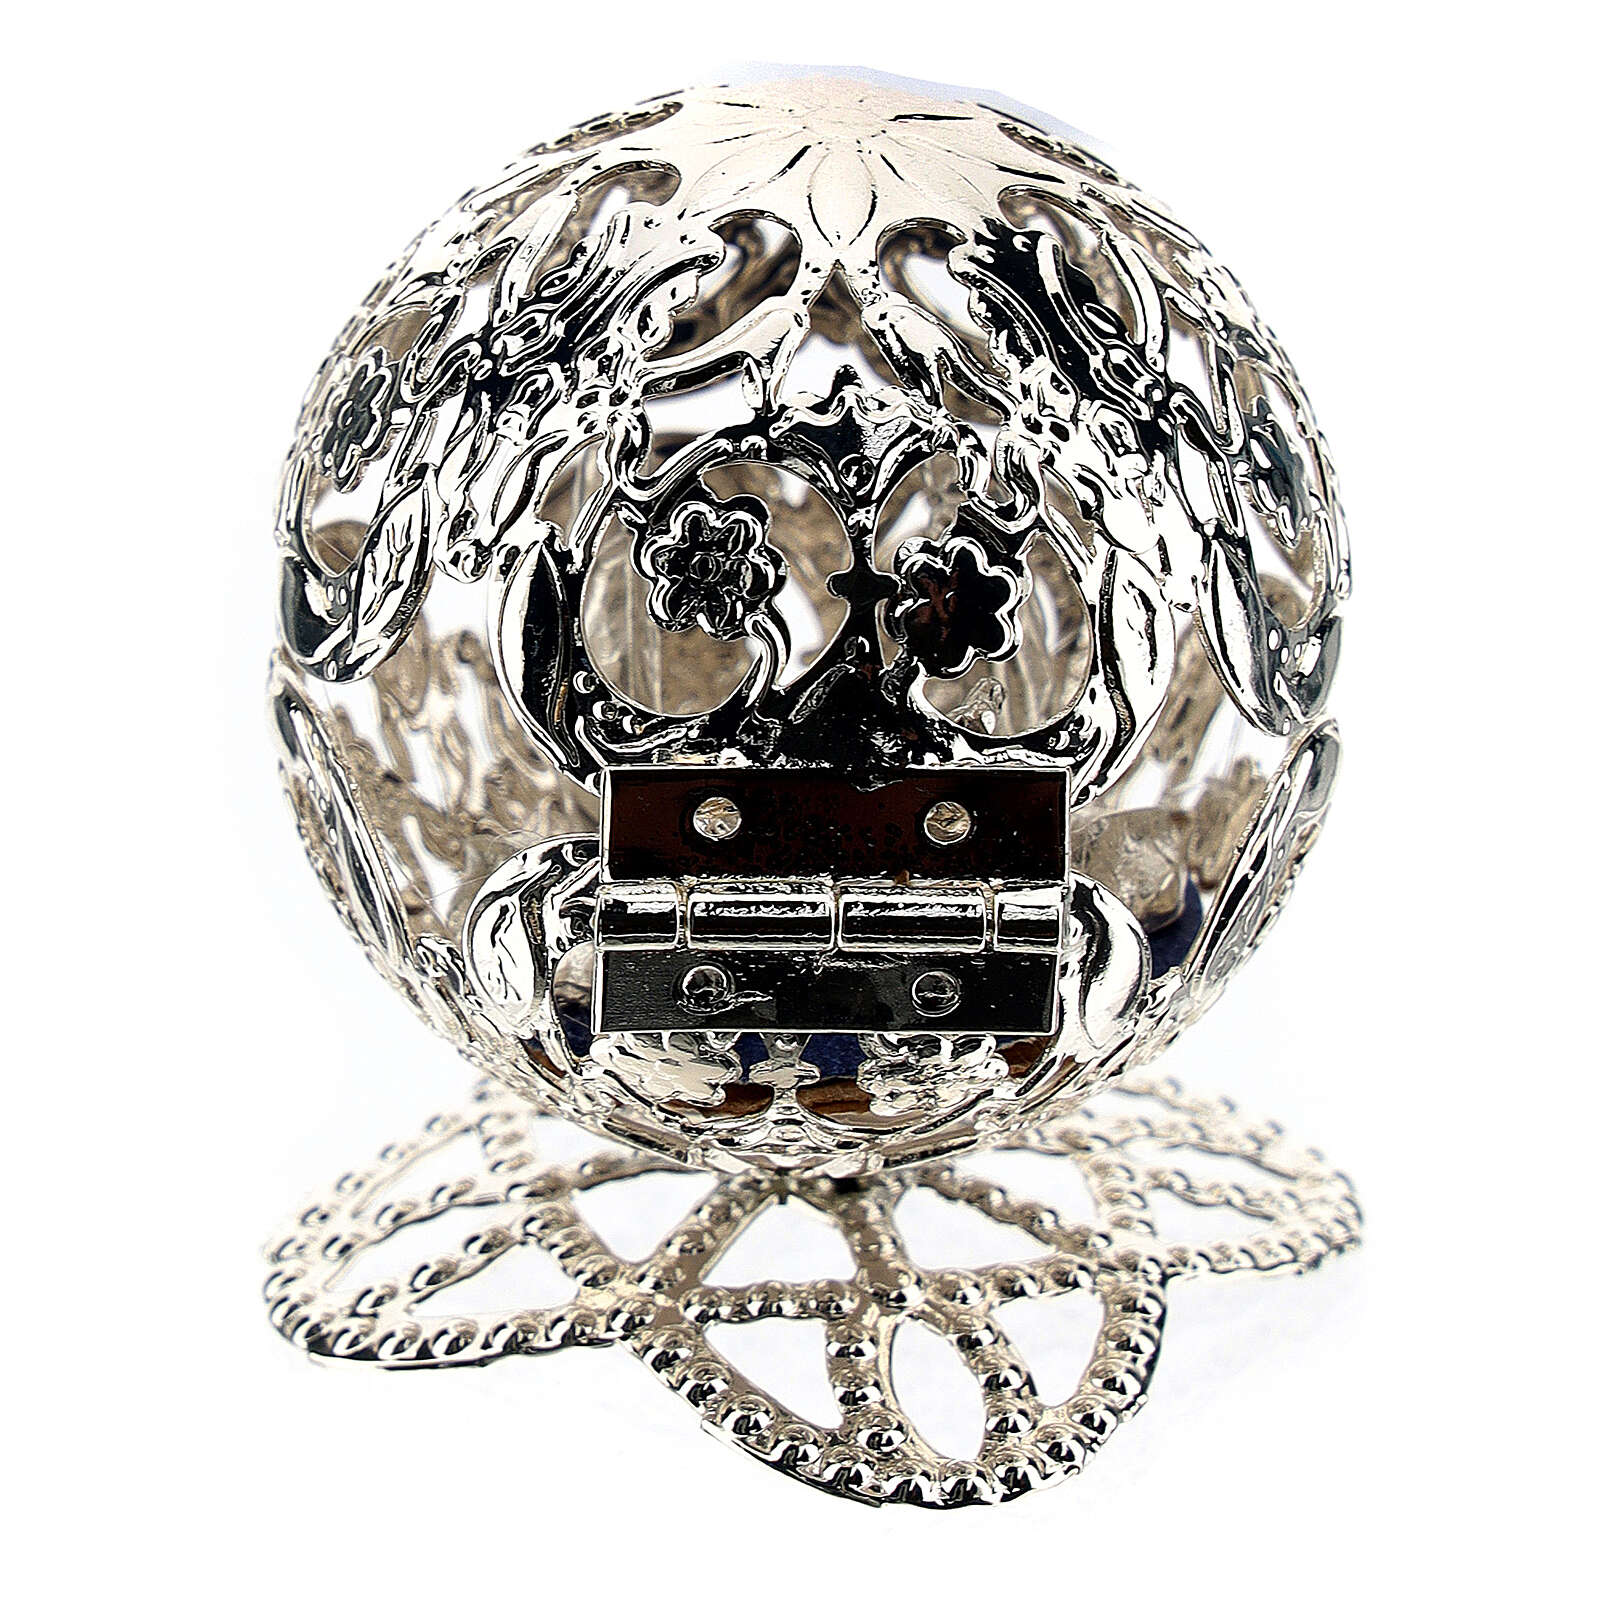 Esfera belén filigrana natividad 4,5 cm 3